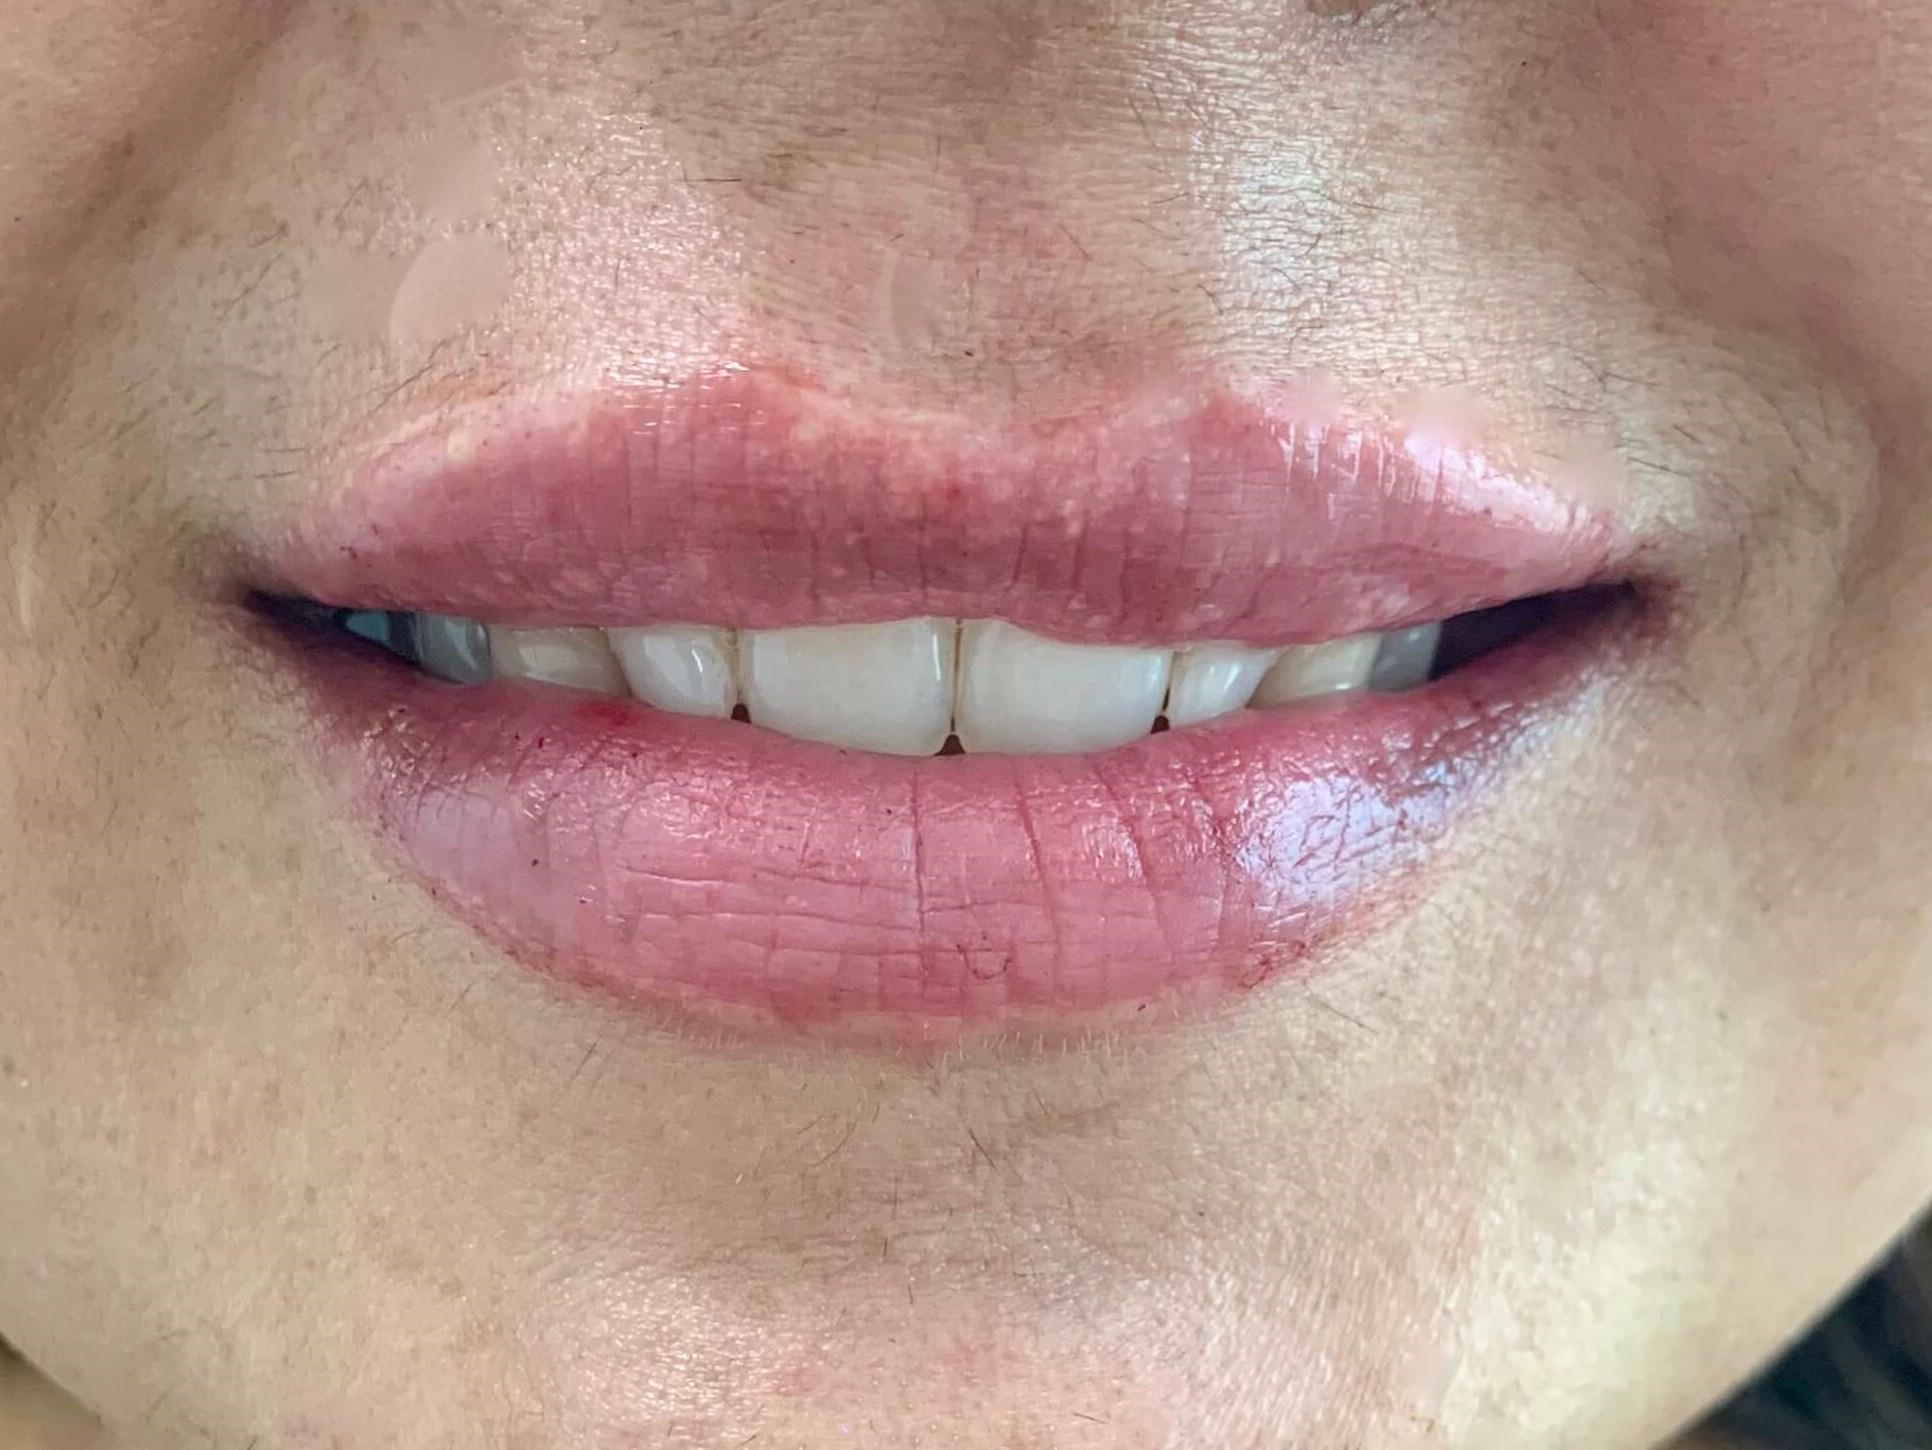 DALLAS WOMAN HAS SUBTLE LIP AUGMENTATION WITH REVANESSE VERSA DERMAL FILLER